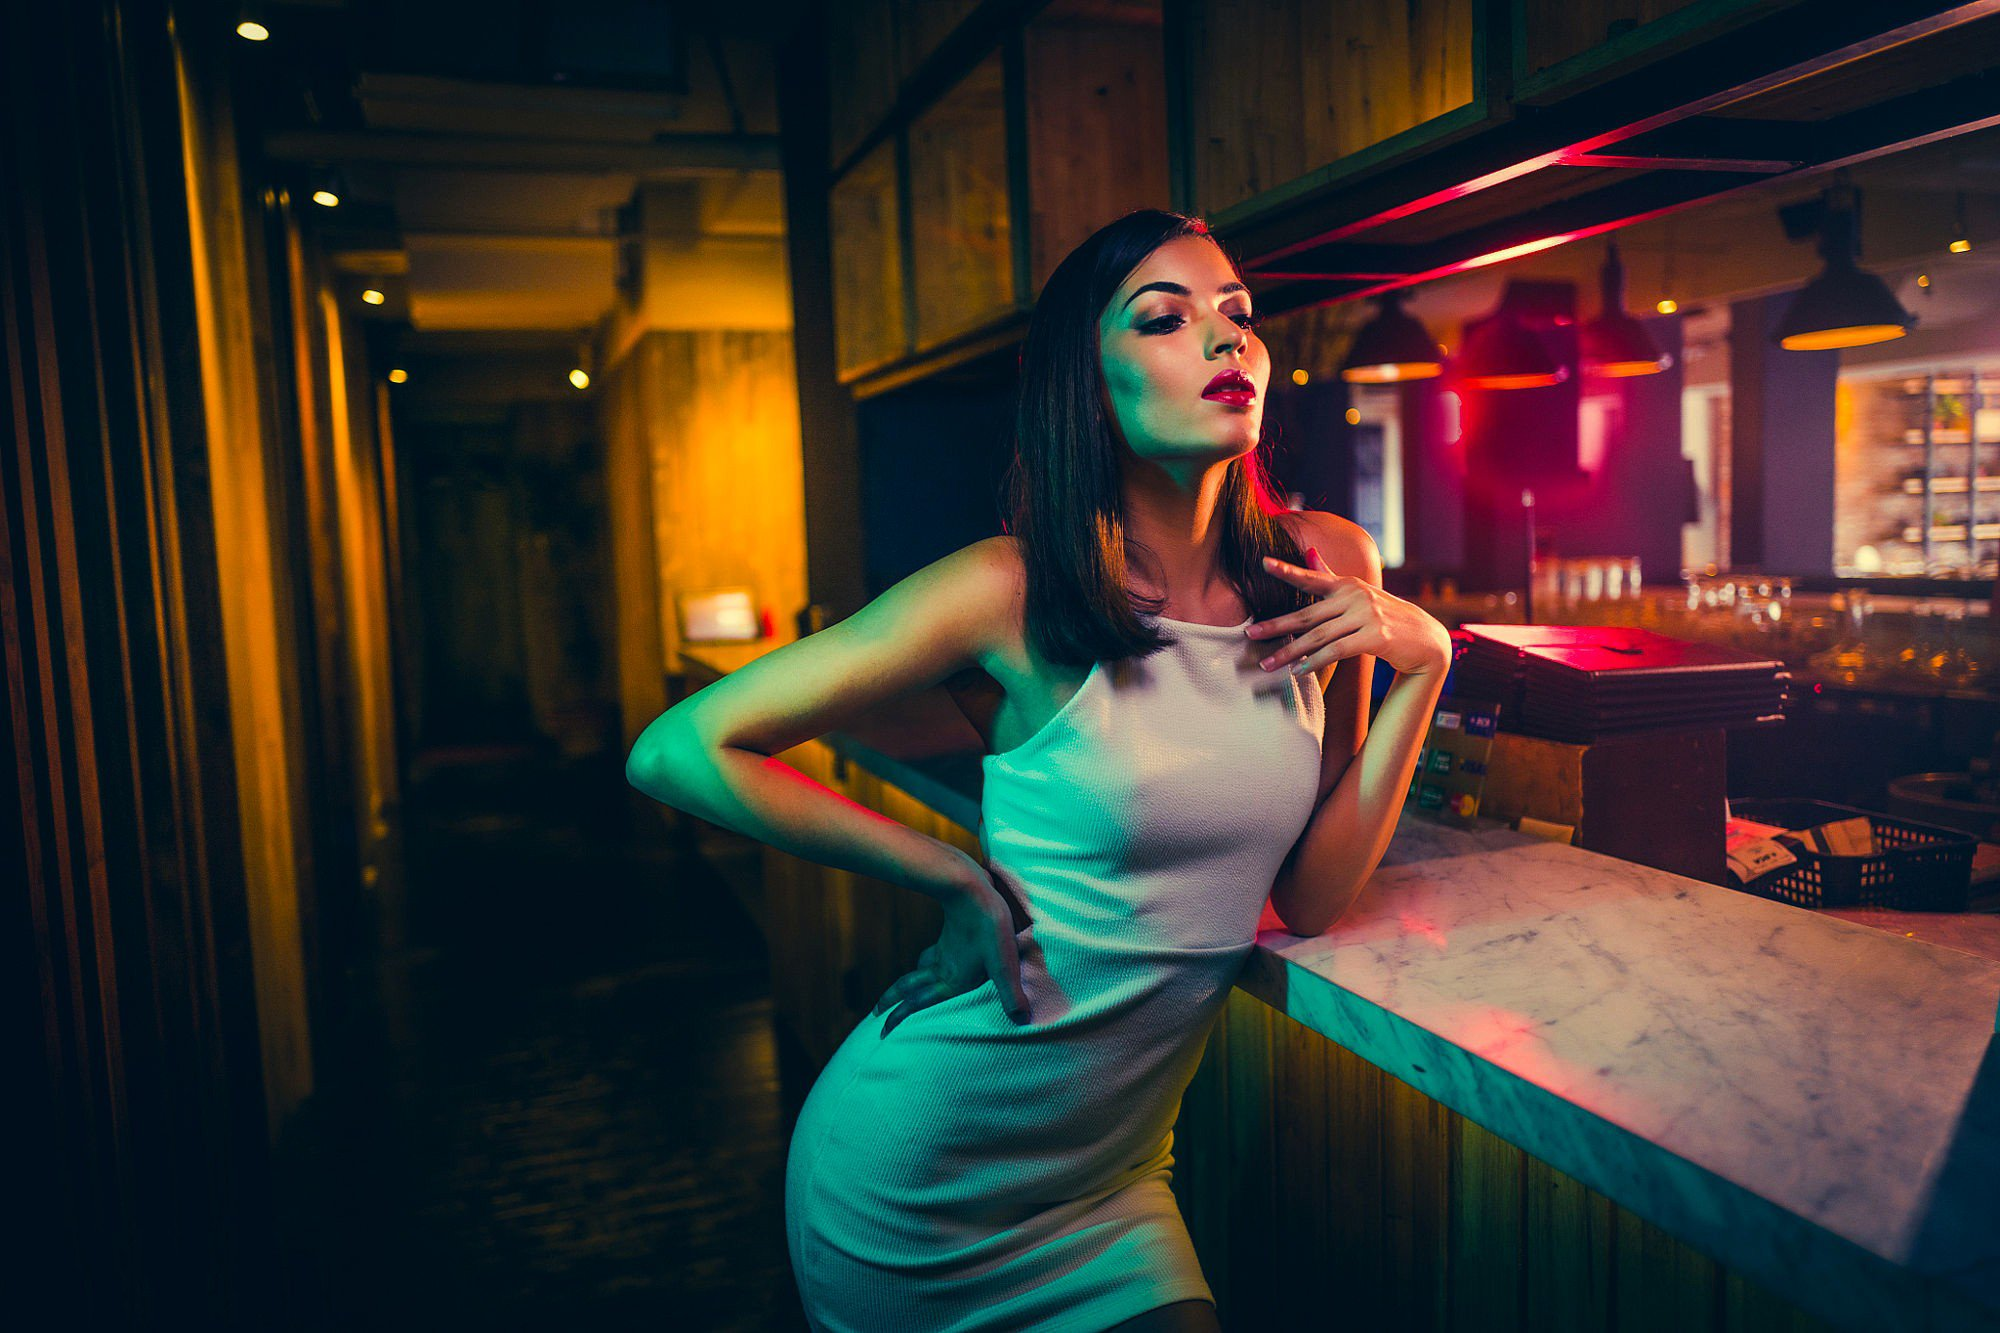 girl-in-bar-wallpaper